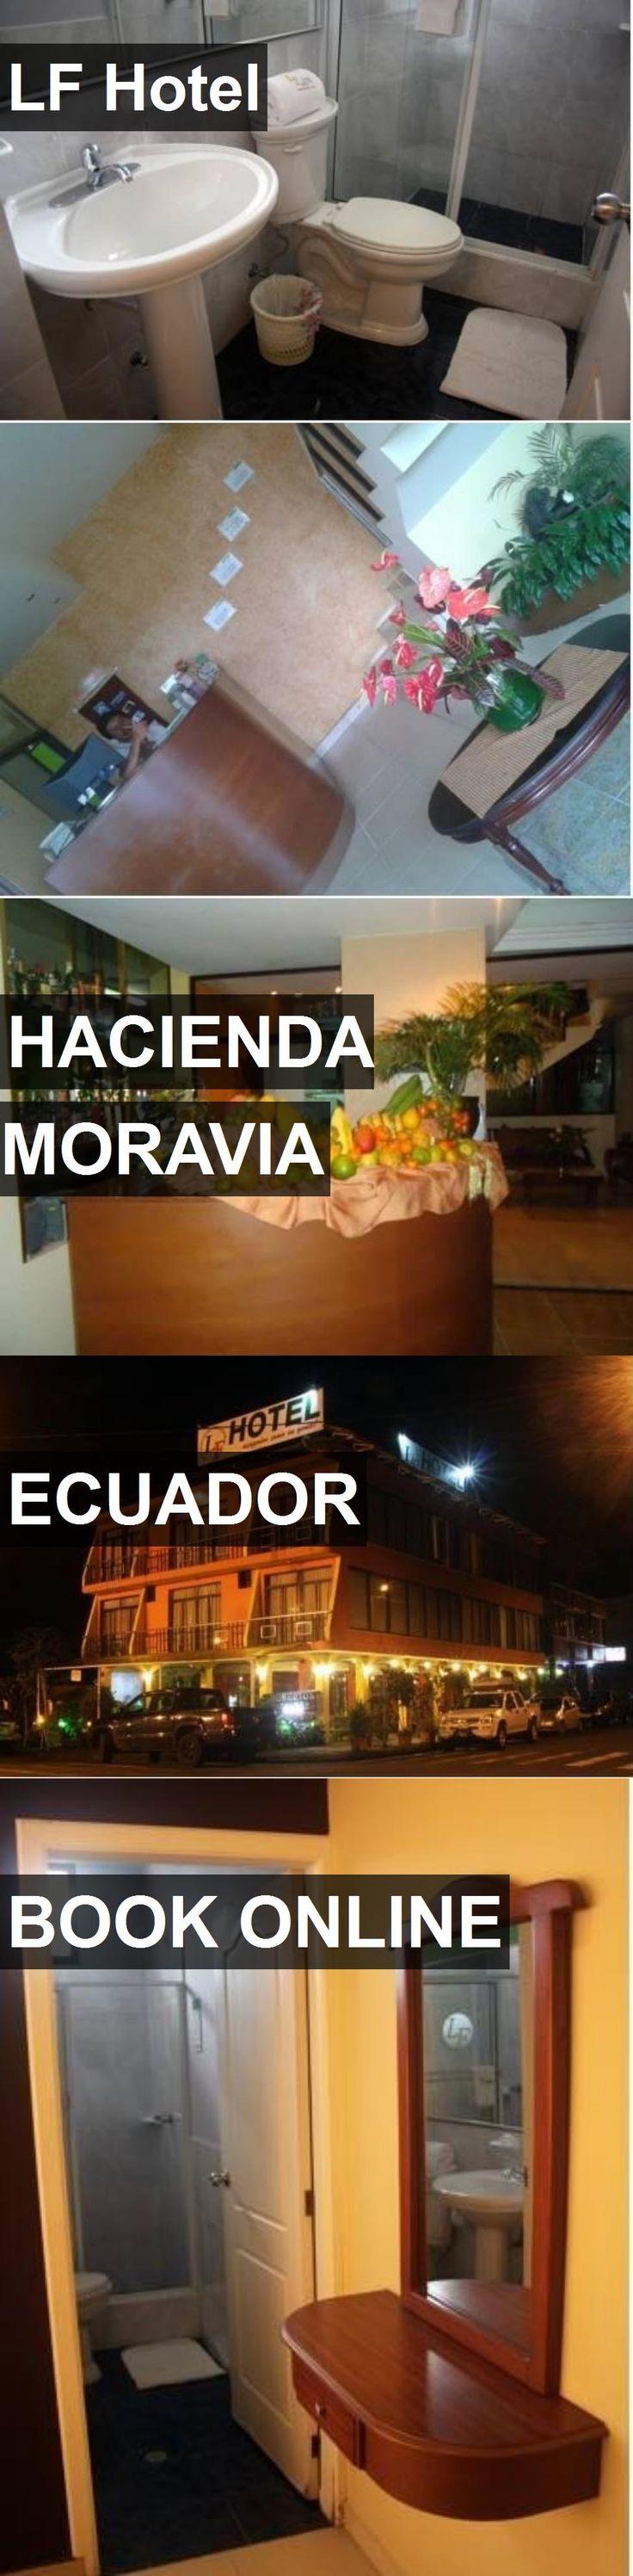 LF Hotel in Hacienda Moravia, Ecuador. For more information, photos, reviews and best prices please follow the link. #Ecuador #HaciendaMoravia #travel #vacation #hotel